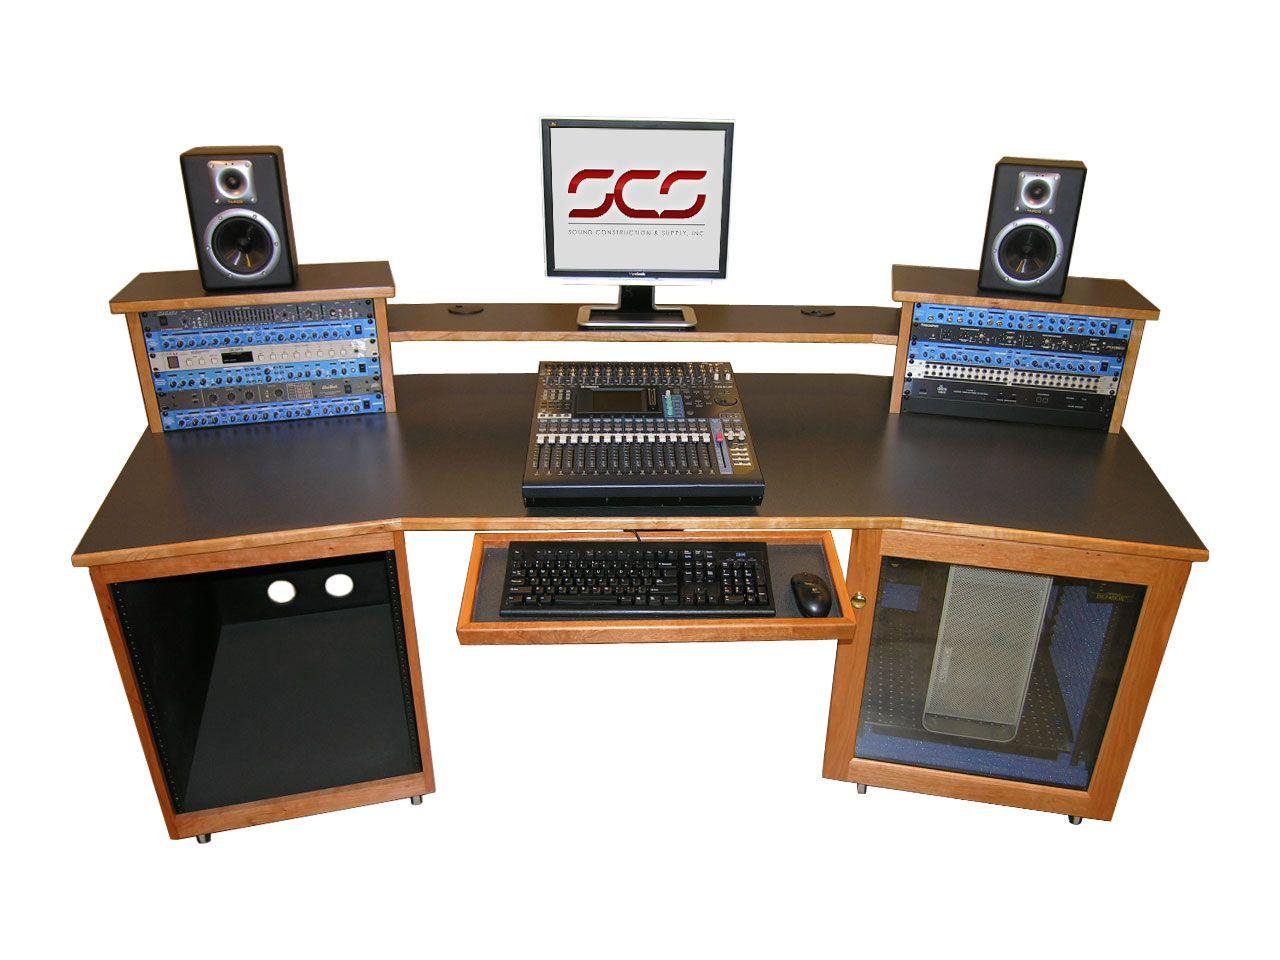 SCS Digistation Recording Studio Desks | Home studio ...